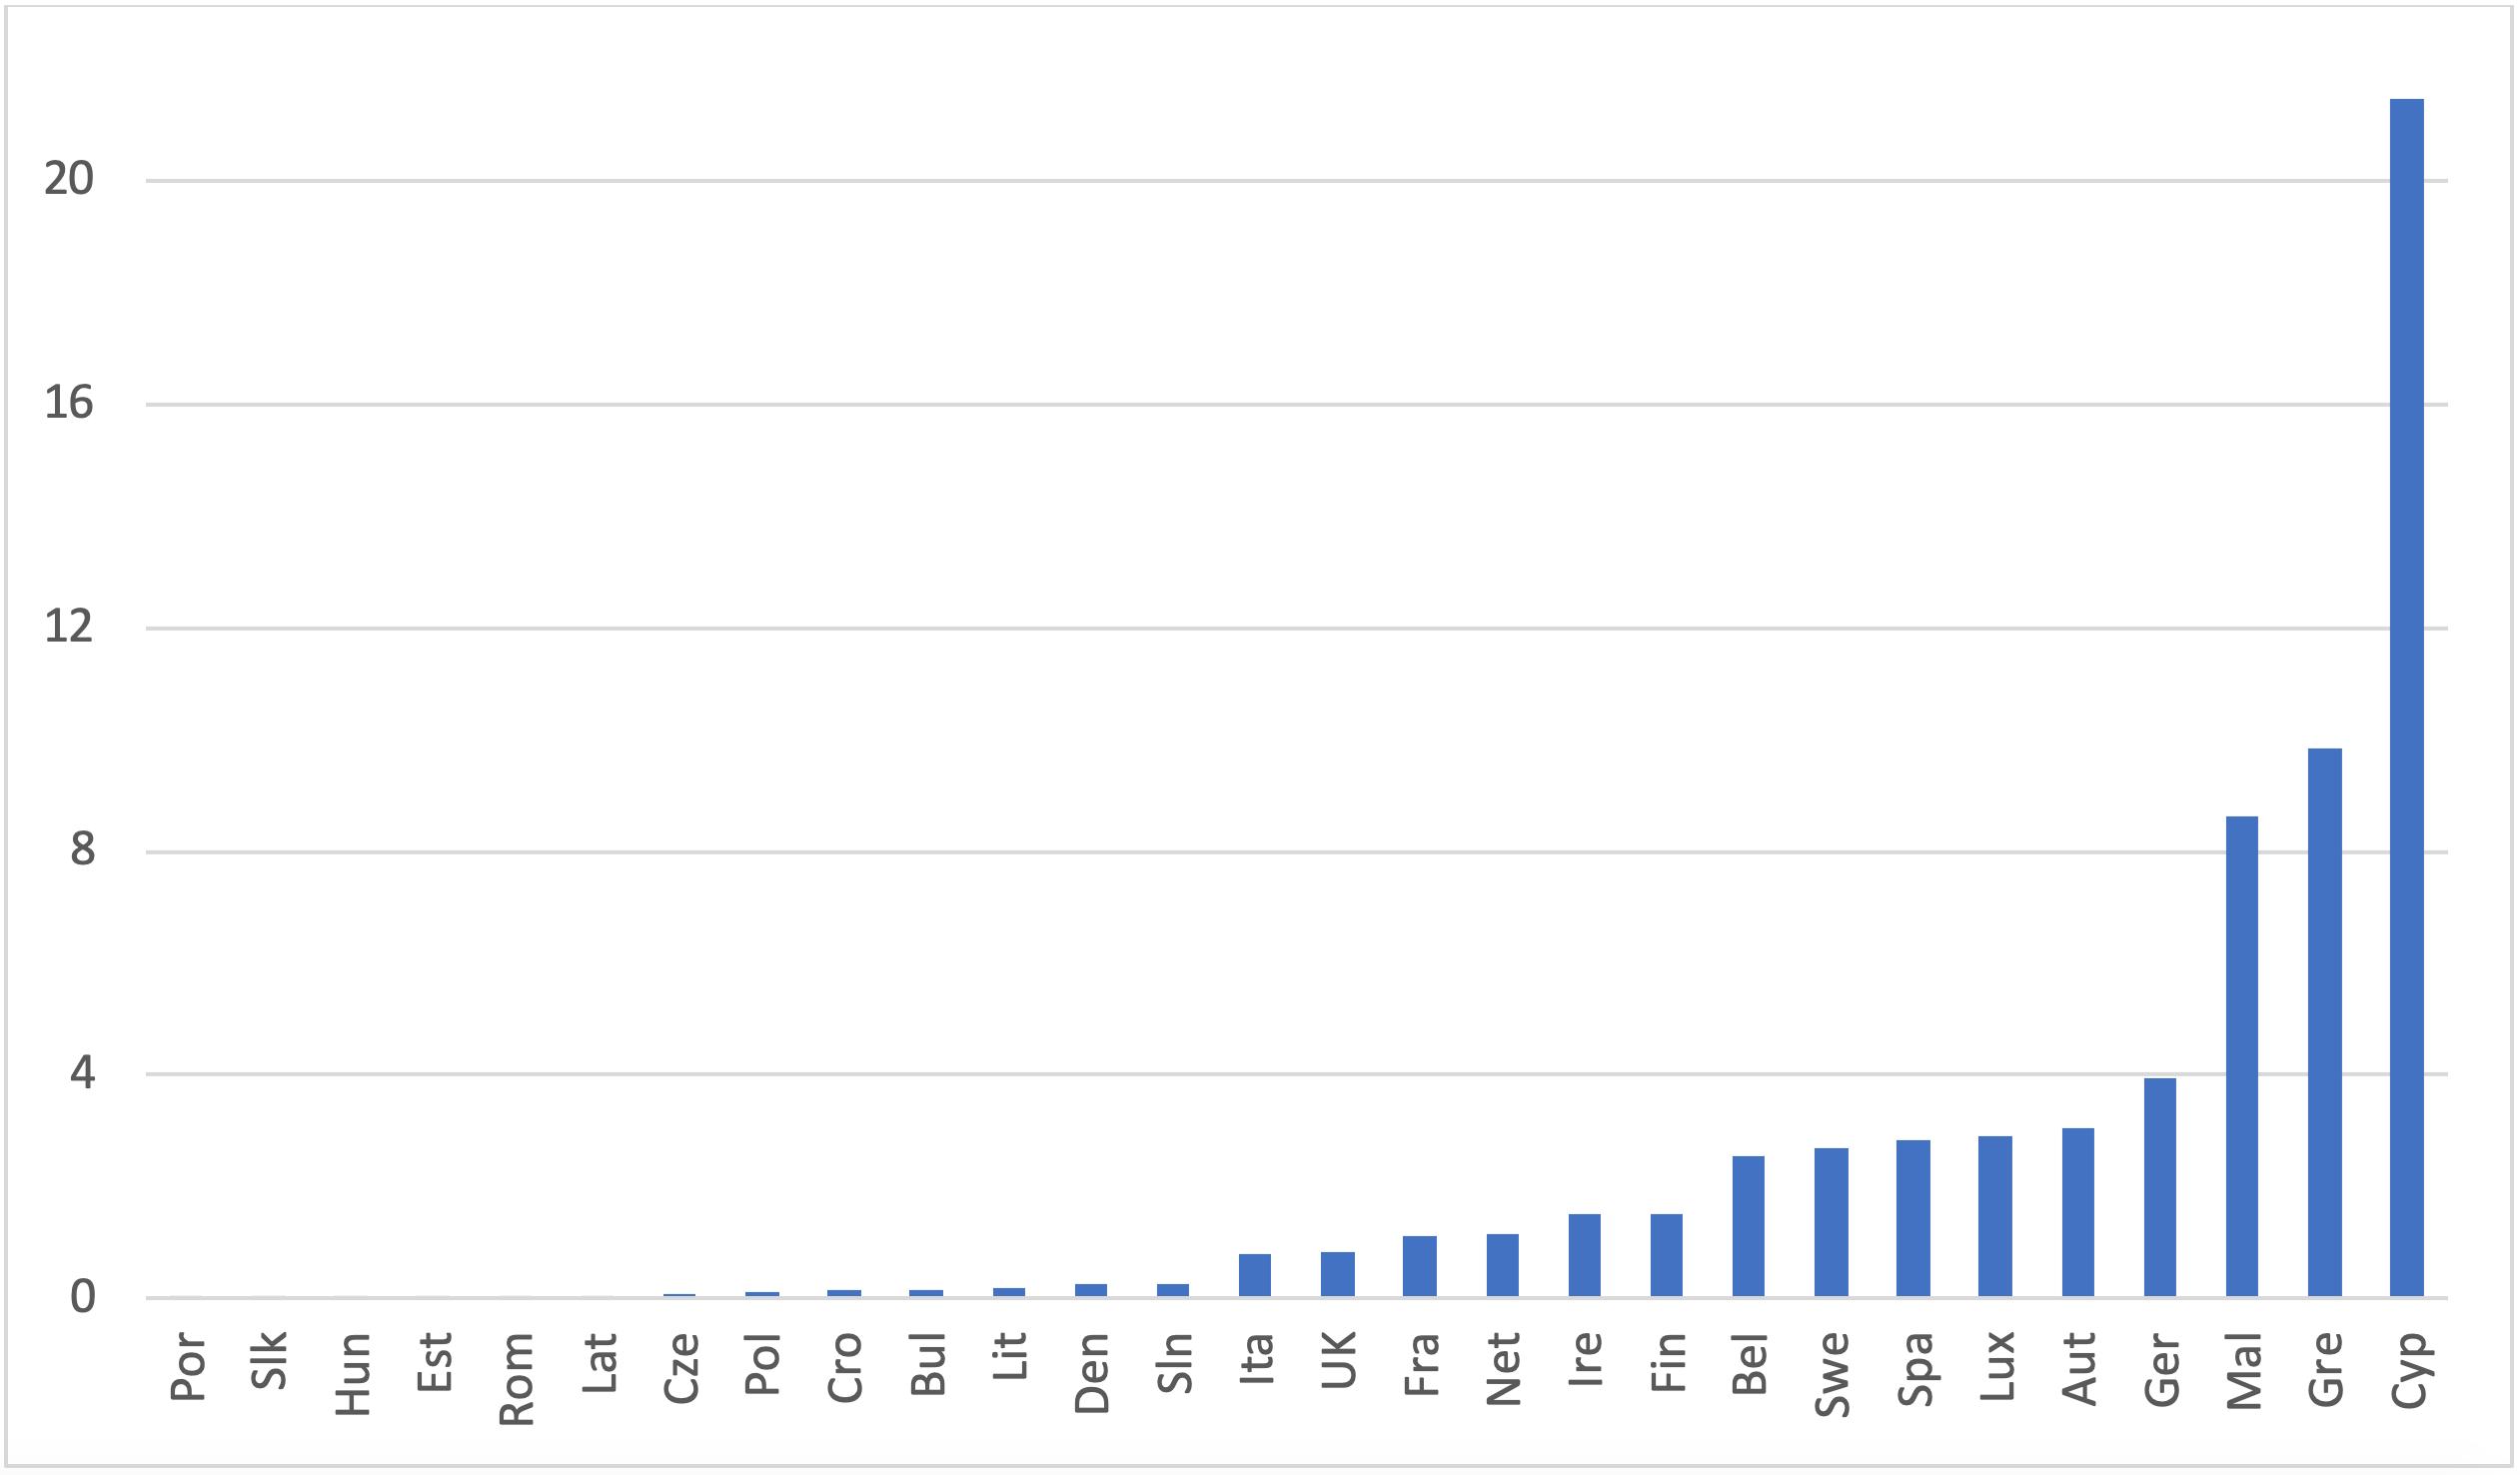 Pending asylum applications at end of 2019, per 1,000 citizens